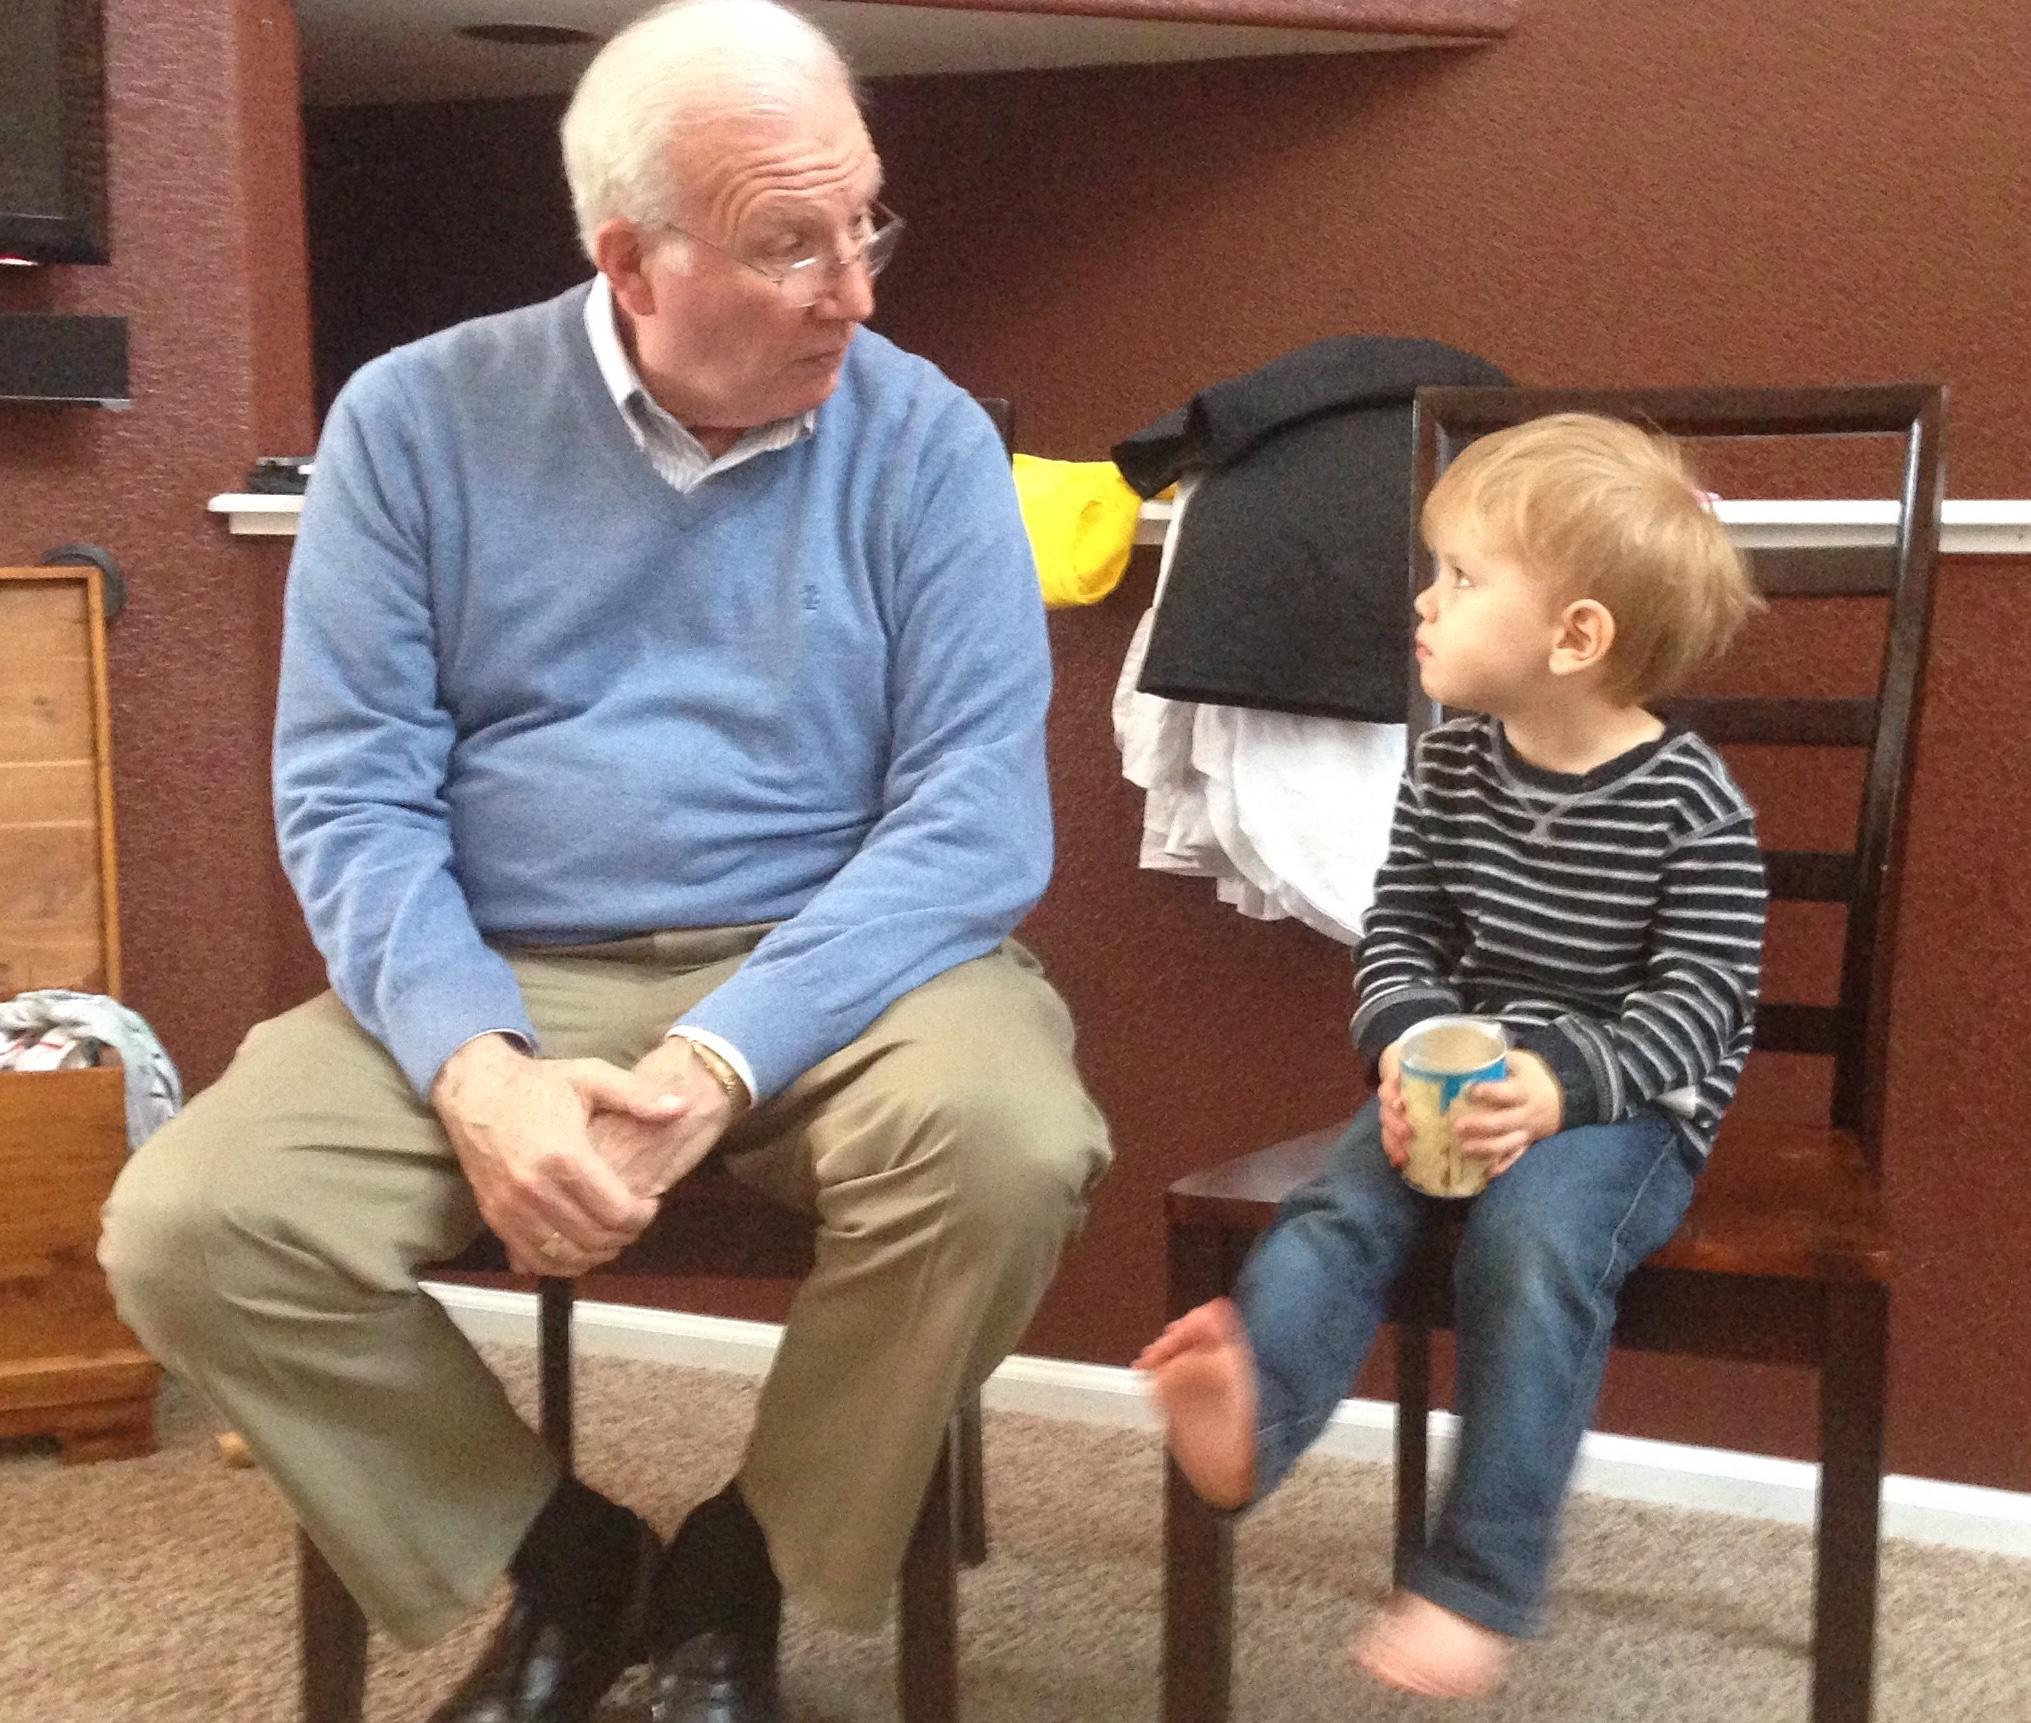 Papa in deep conversation with a grandboy